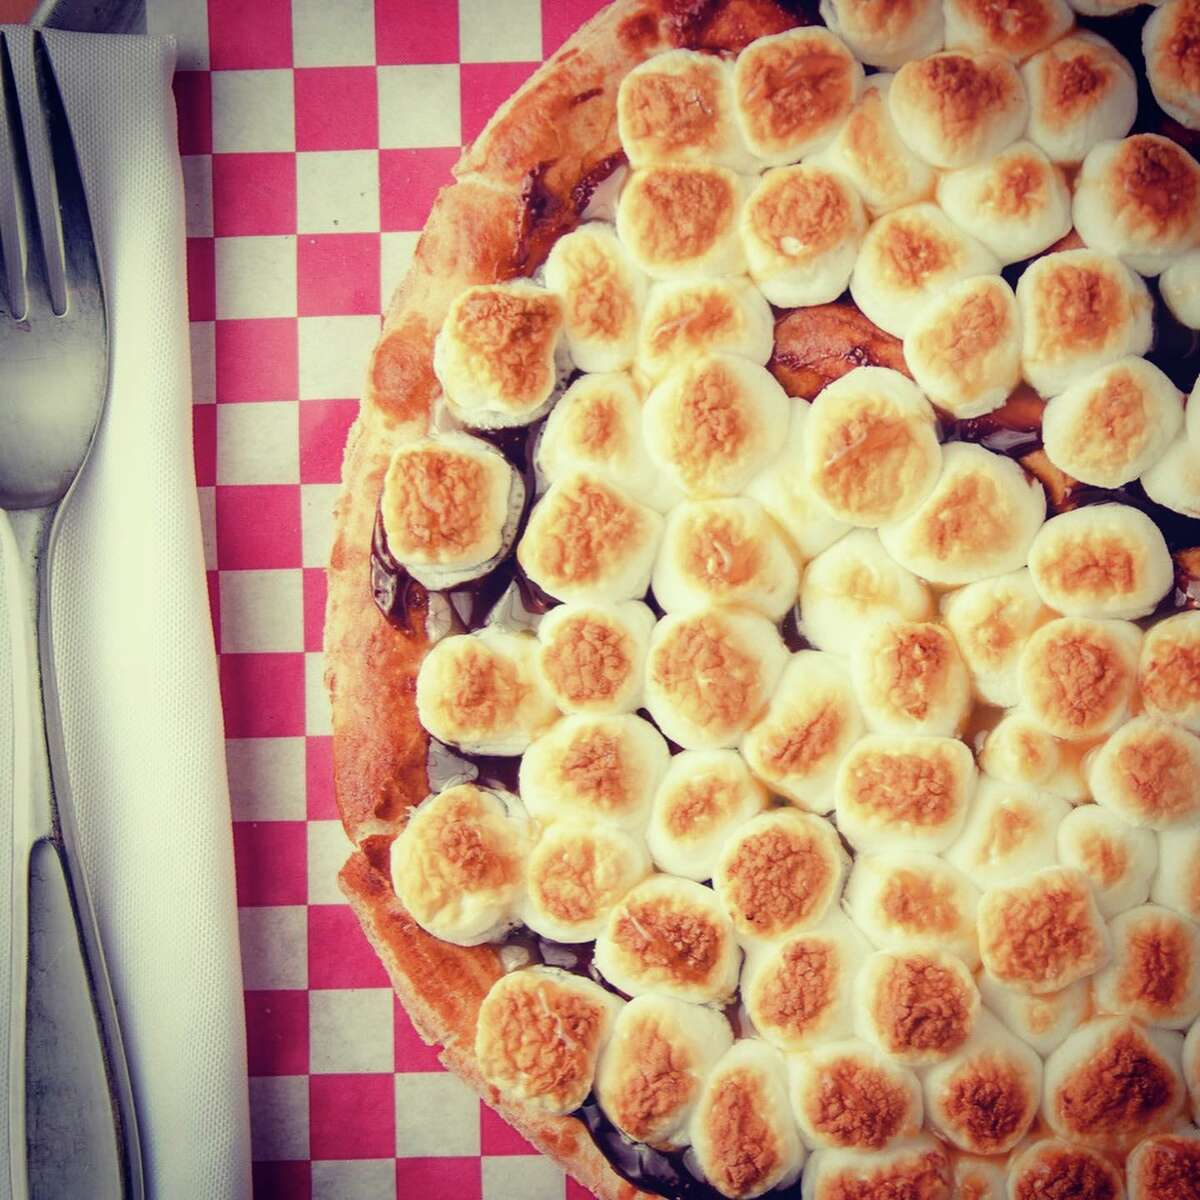 Marshmallow pizza is one of La Famiglia's specialty desserts.